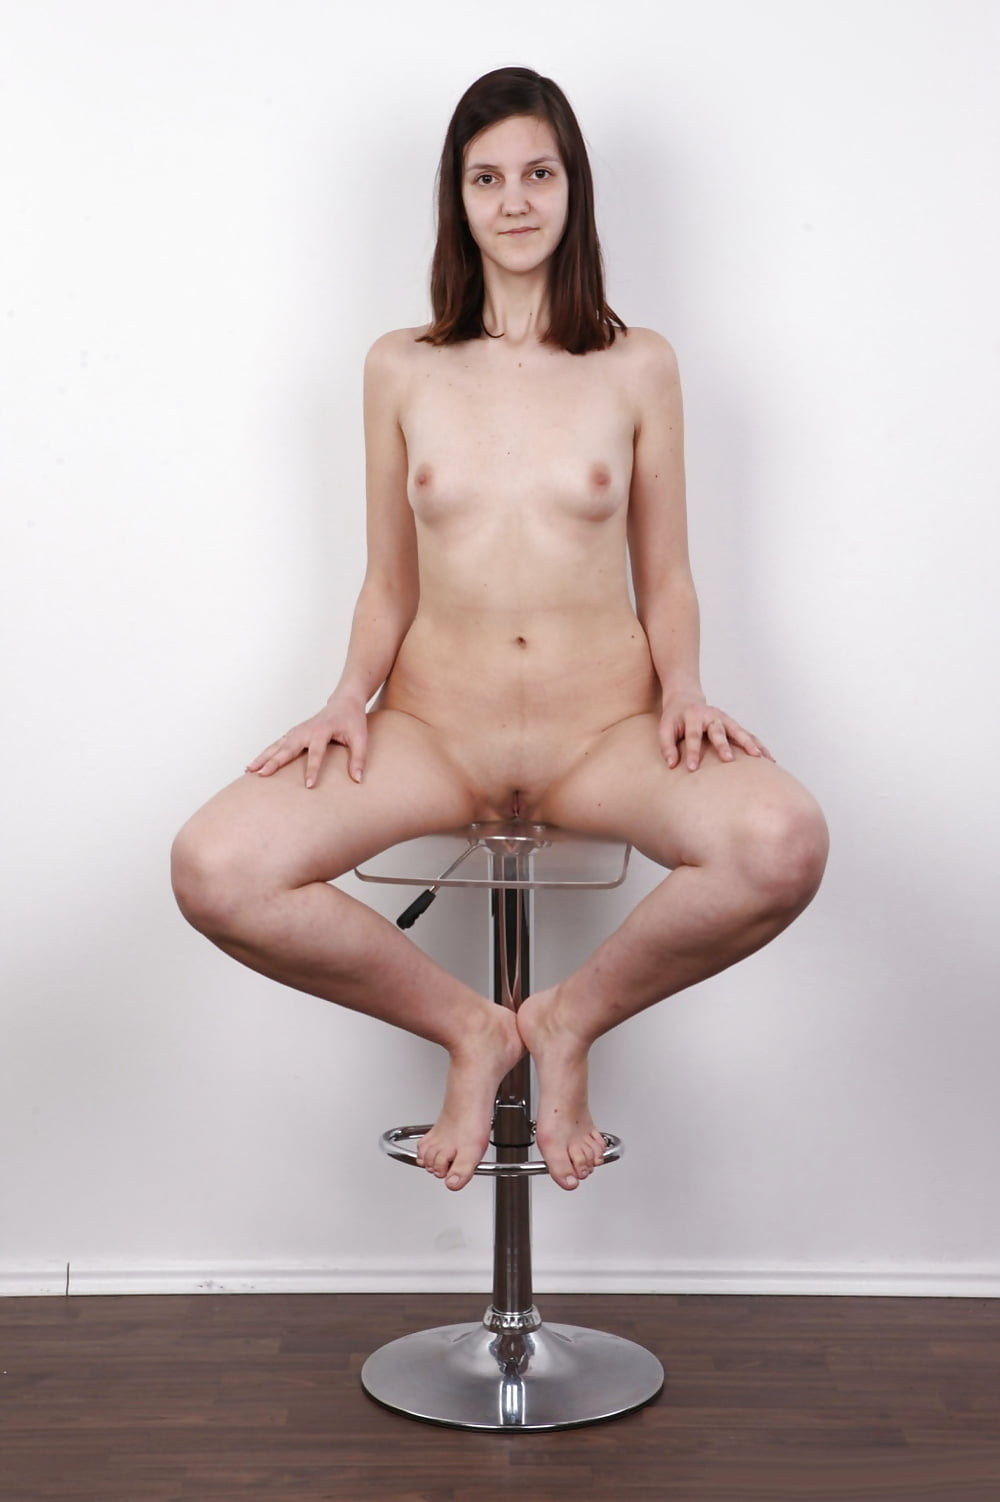 Suck photo girl casting slut load being